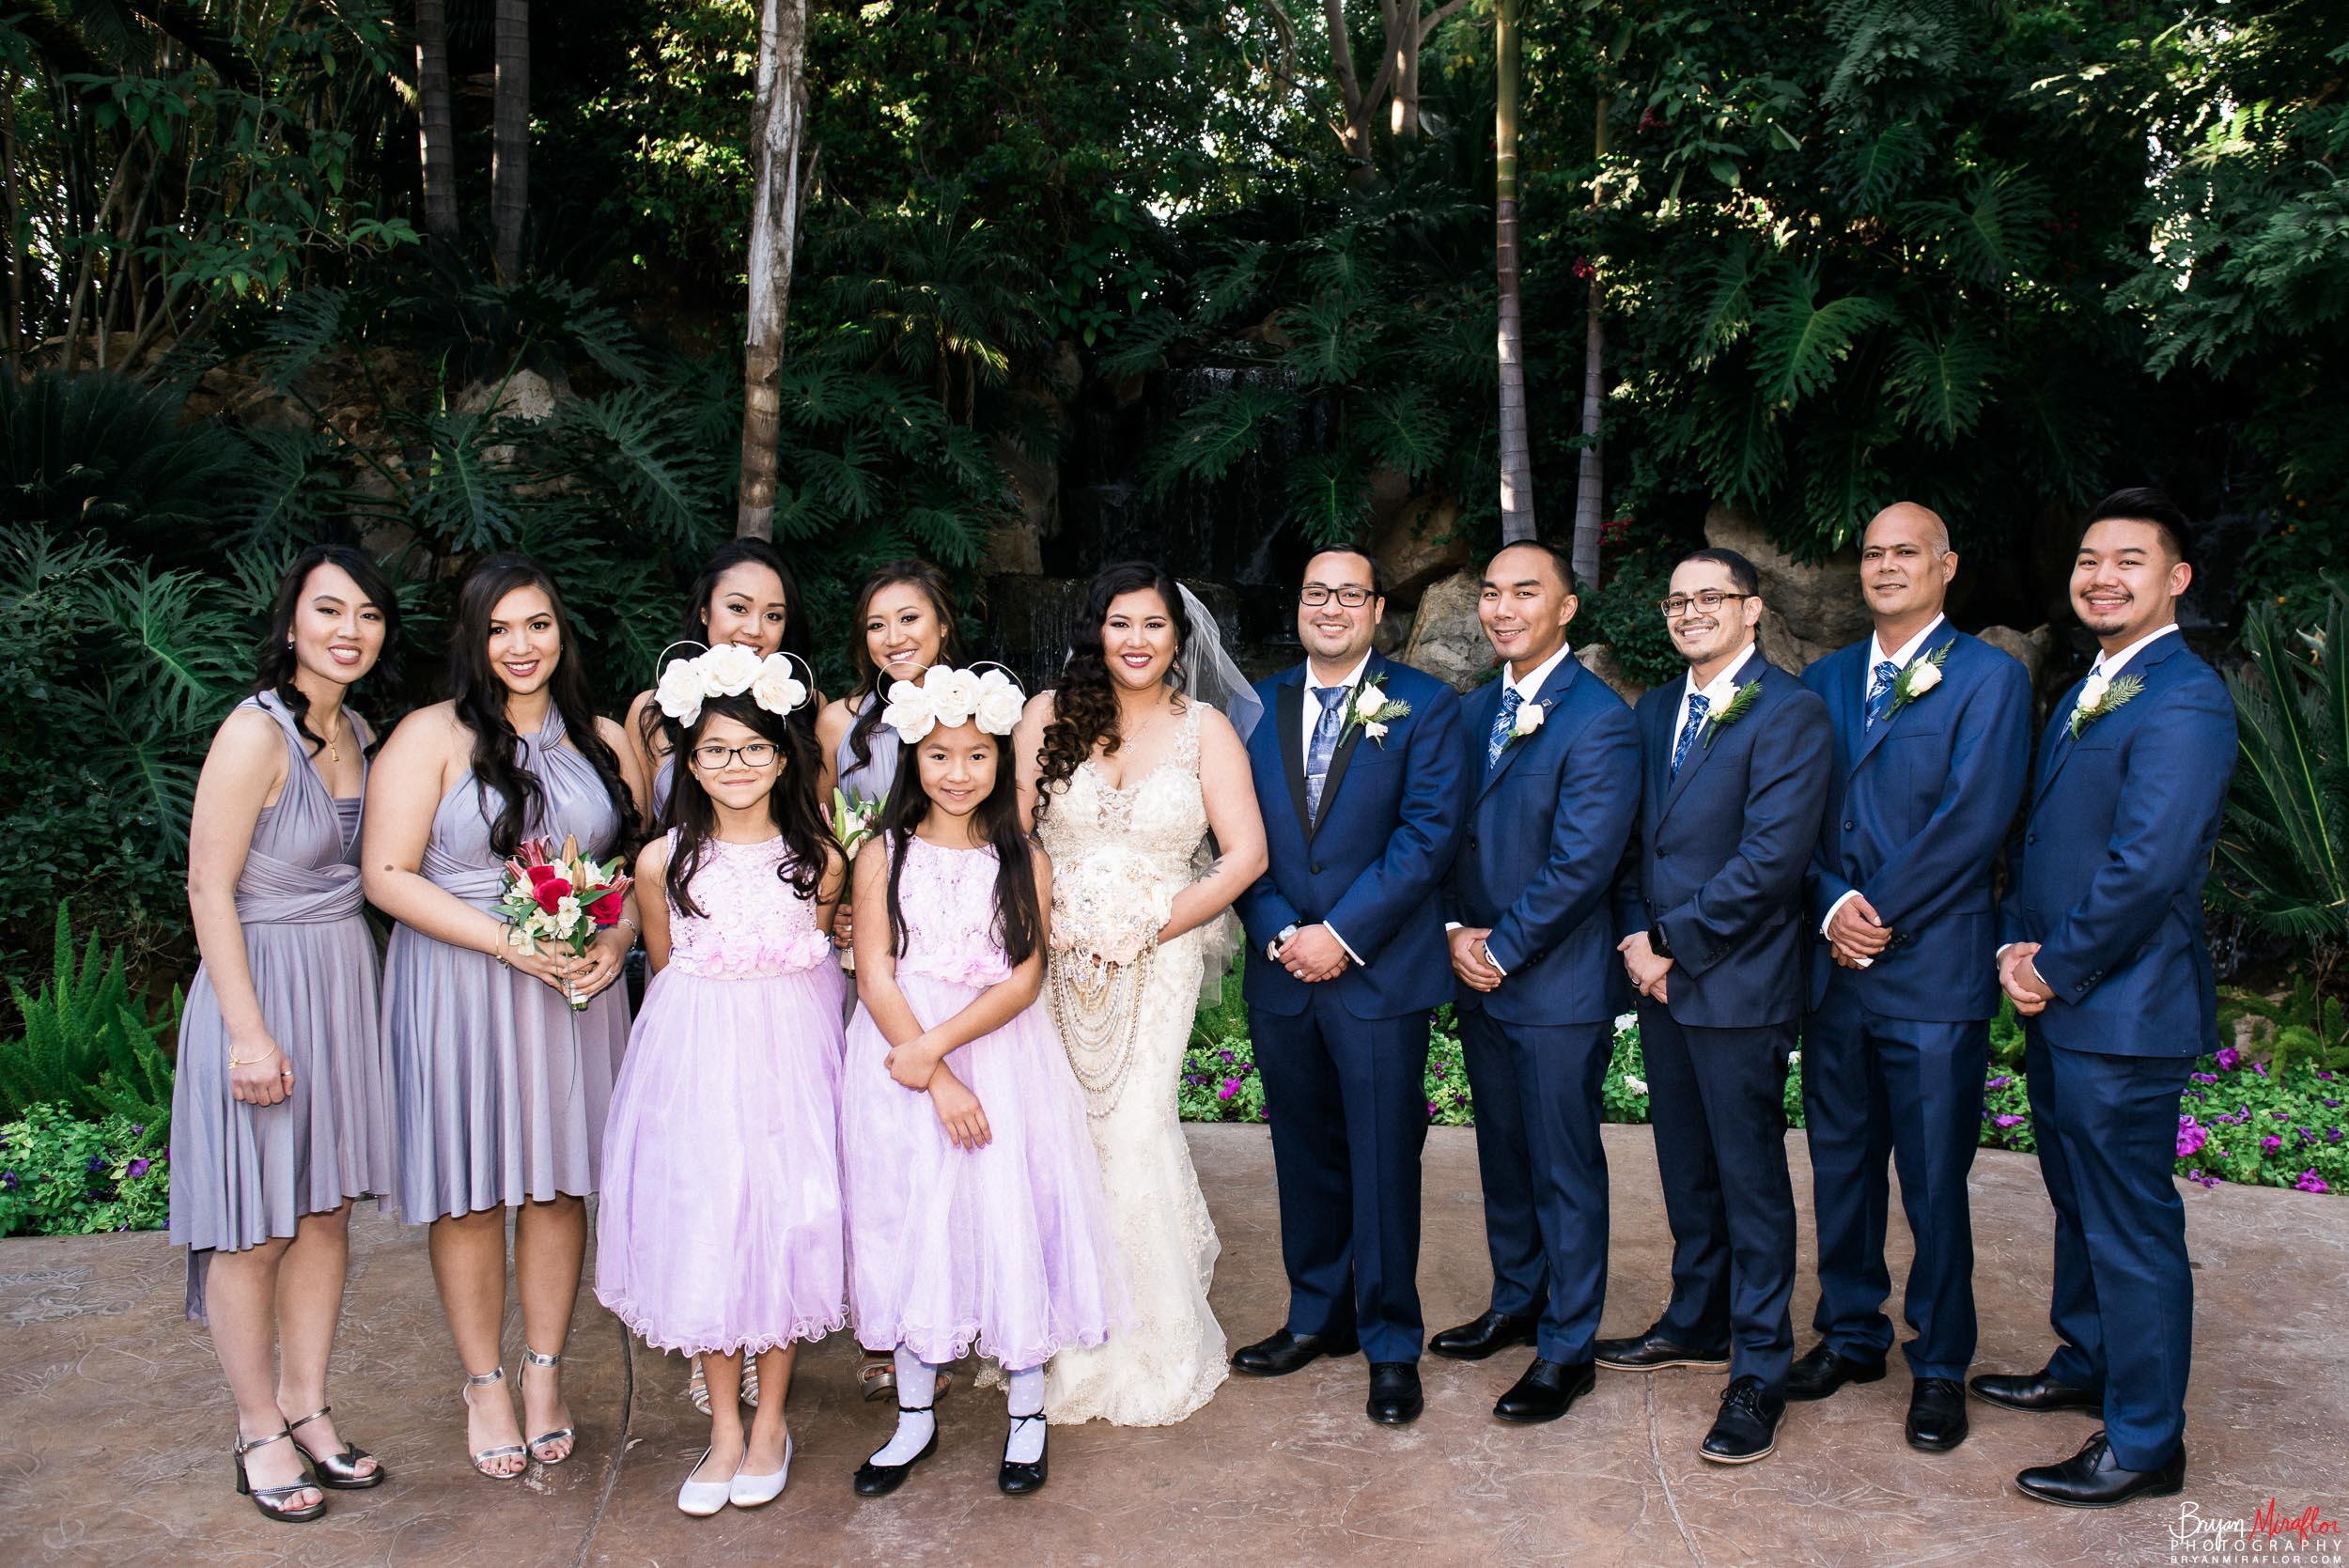 Bryan-Miraflor-Photography-Hannah-Jonathan-Married-Grand-Traditions-Estate-Gardens-Fallbrook-20171222-139.jpg